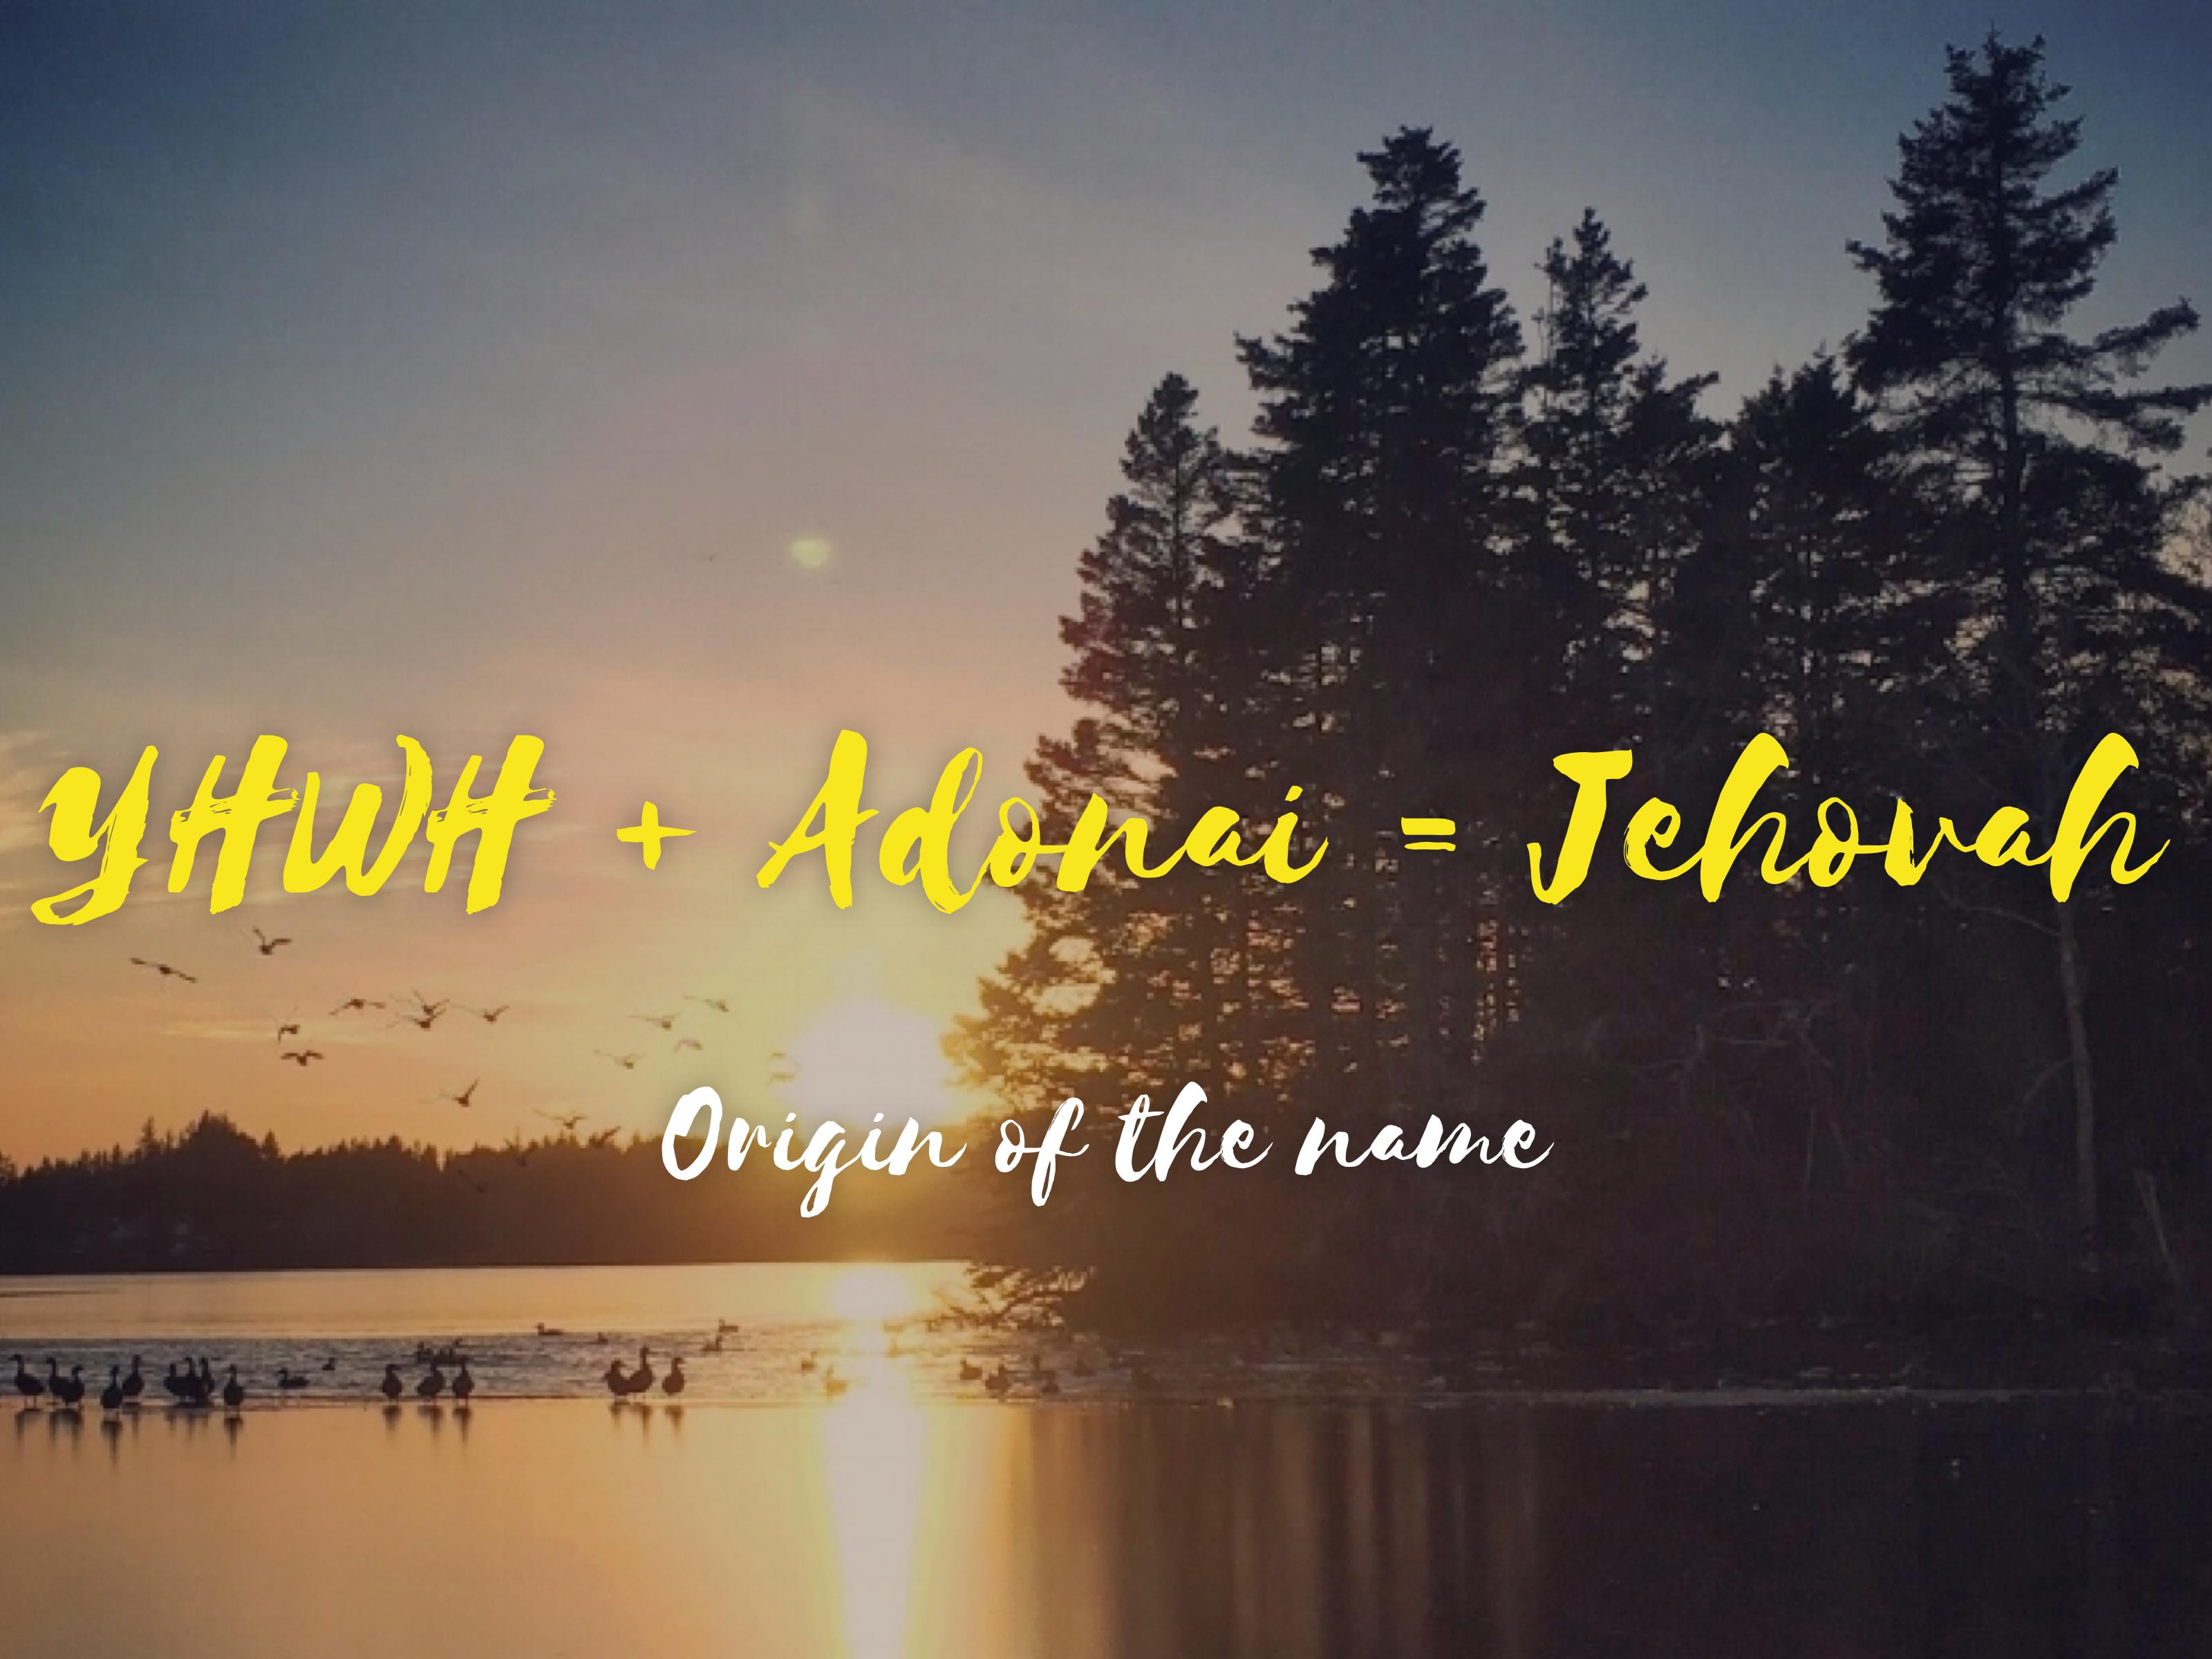 YHWH + Adonai = Jehovah